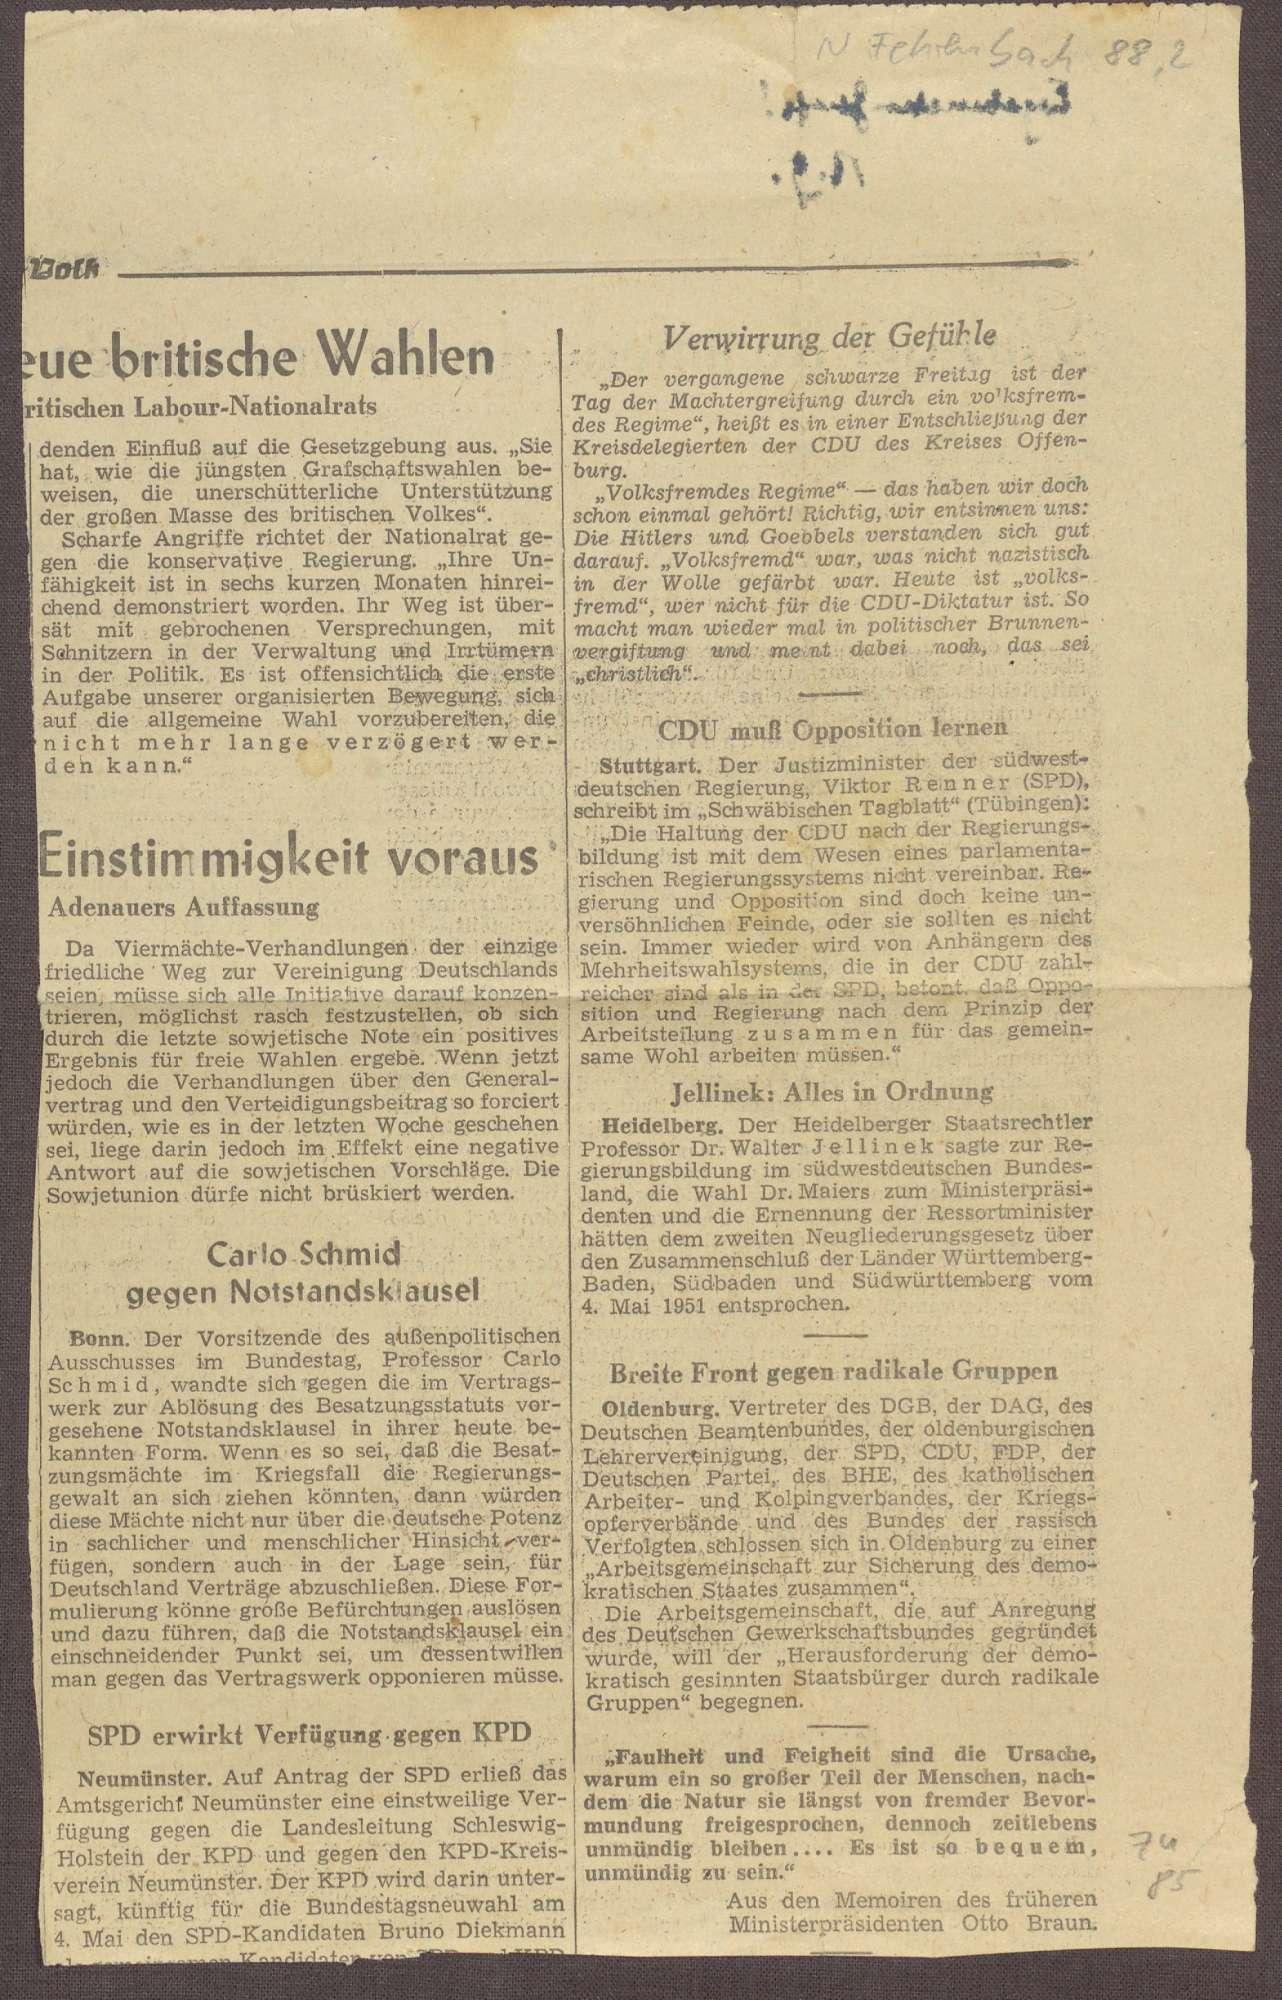 Ausschnitt aus unbekannter Zeitung, Bild 2